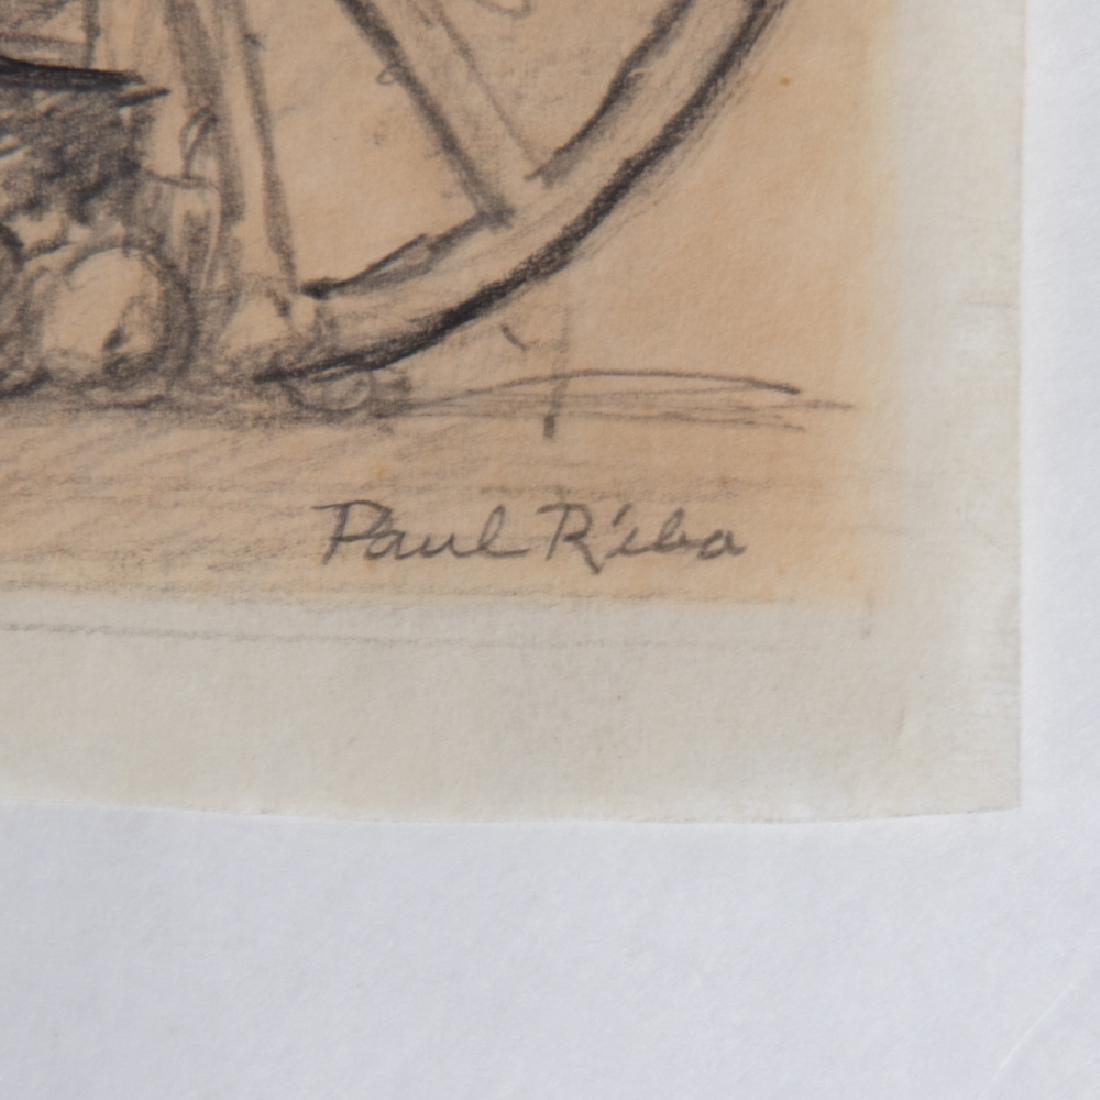 Paul Riba (1912-1977) A Group of Six Studies of Birds - 3